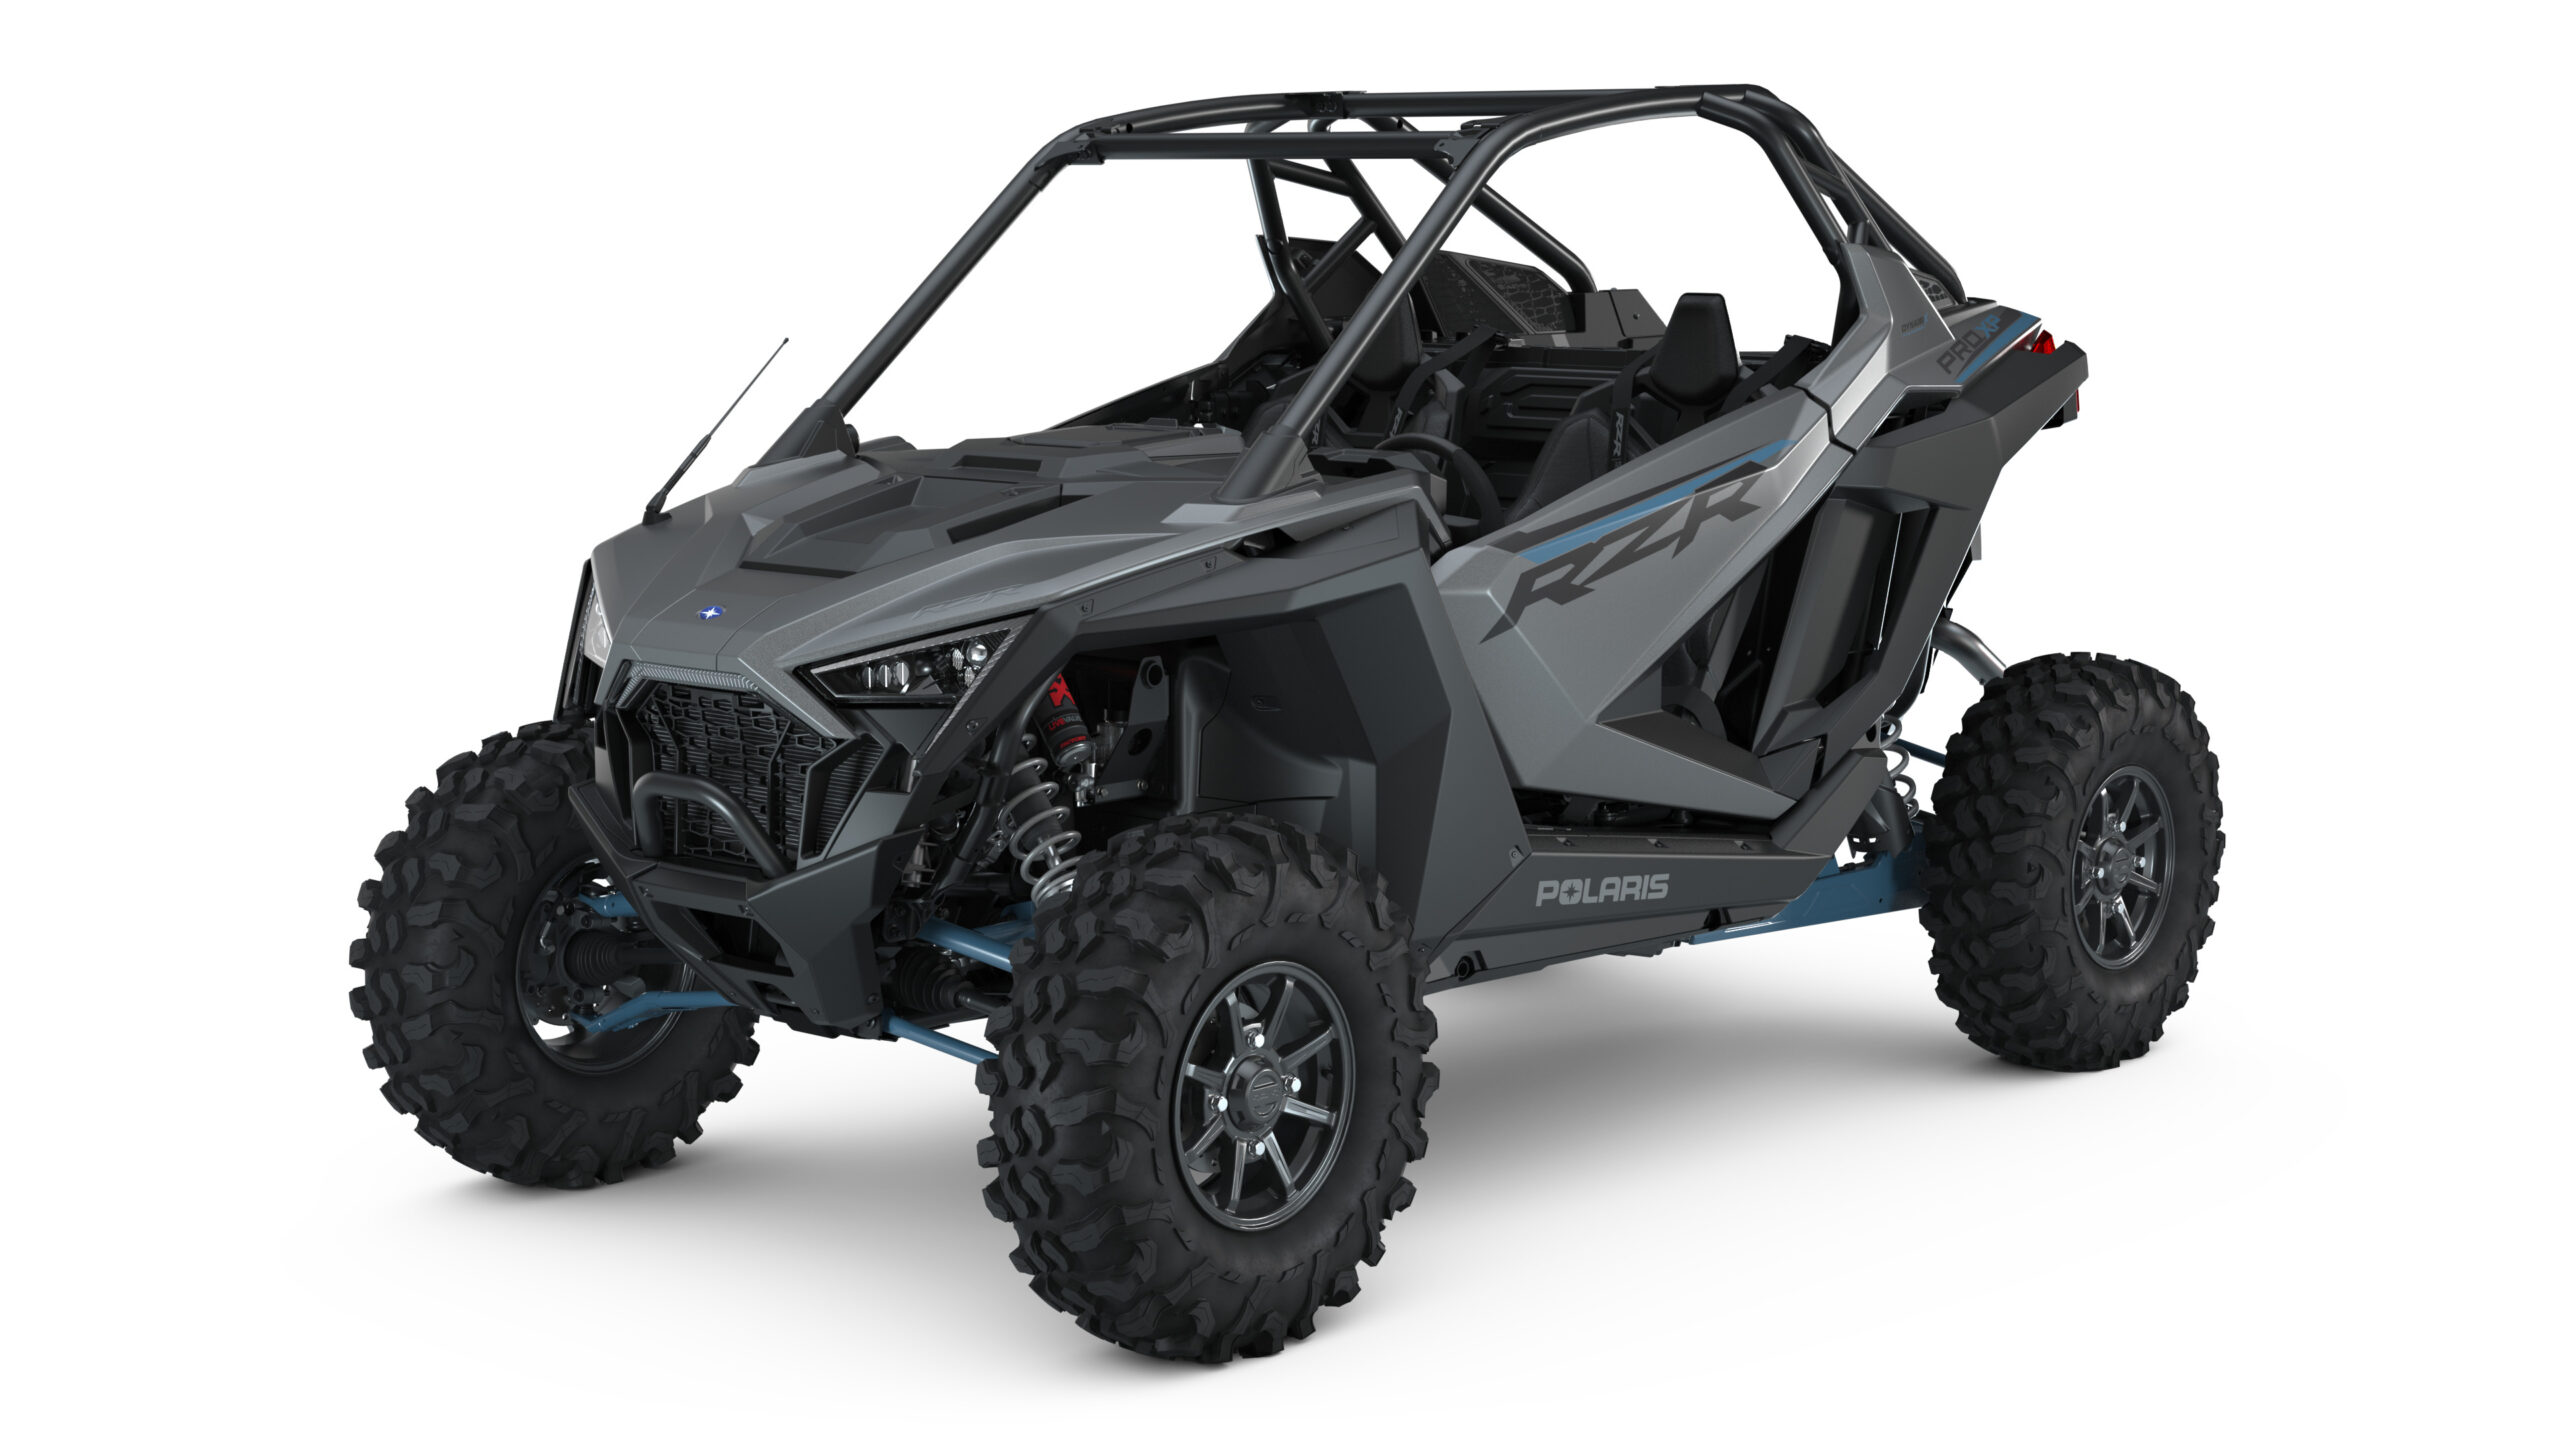 МОТОВЕЗДЕХОД POLARIS RZR PRO XP Ultimate  Артмото - купить квадроцикл в украине и харькове, мотоцикл, снегоход, скутер, мопед, электромобиль